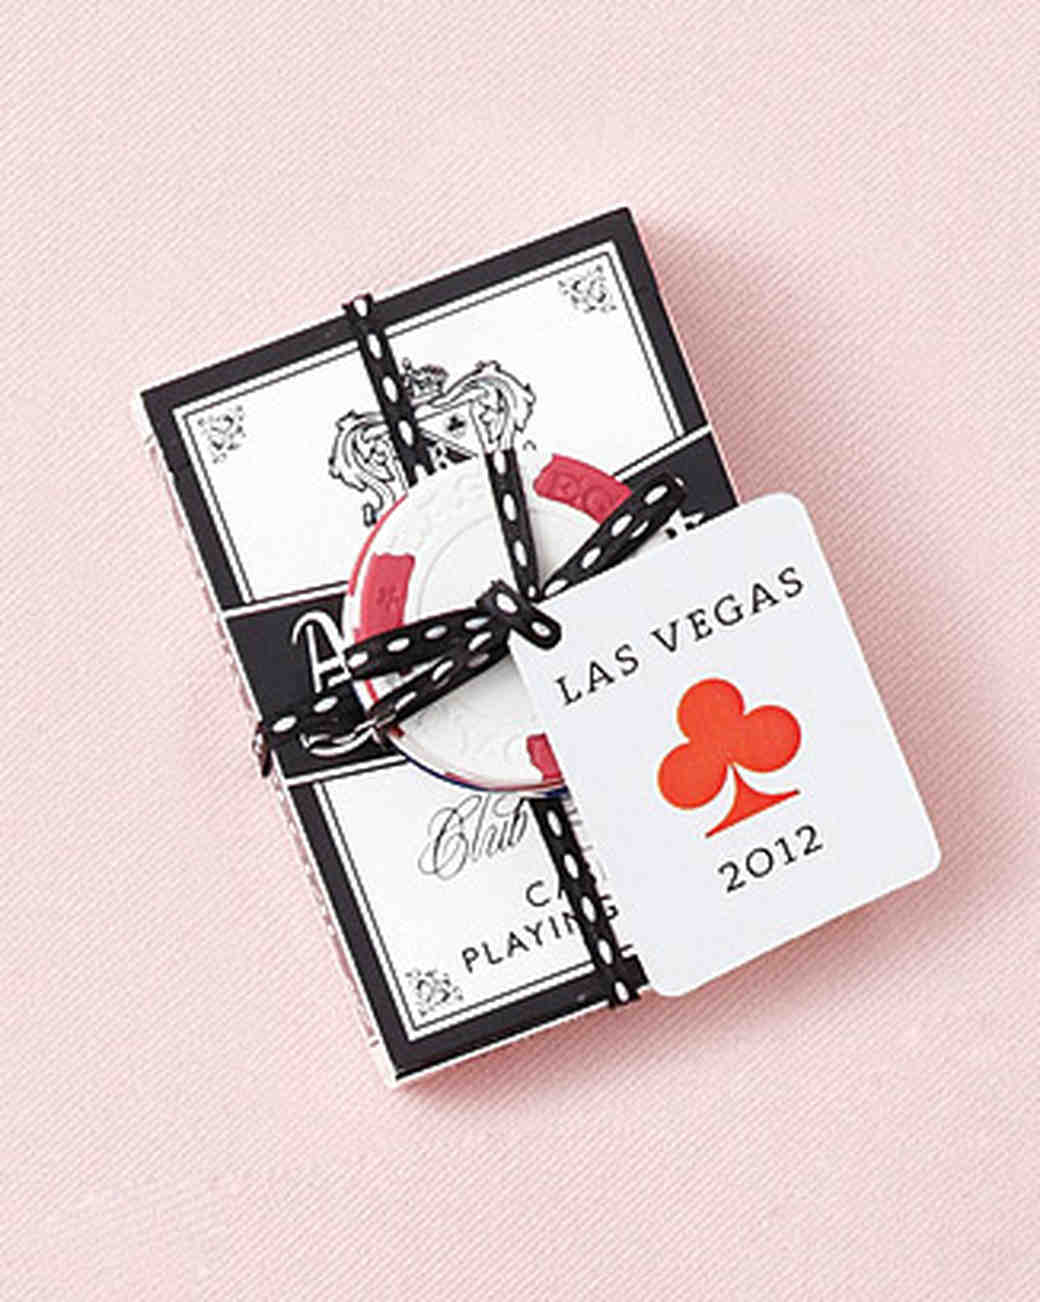 favors-cards-mwd107607.jpg